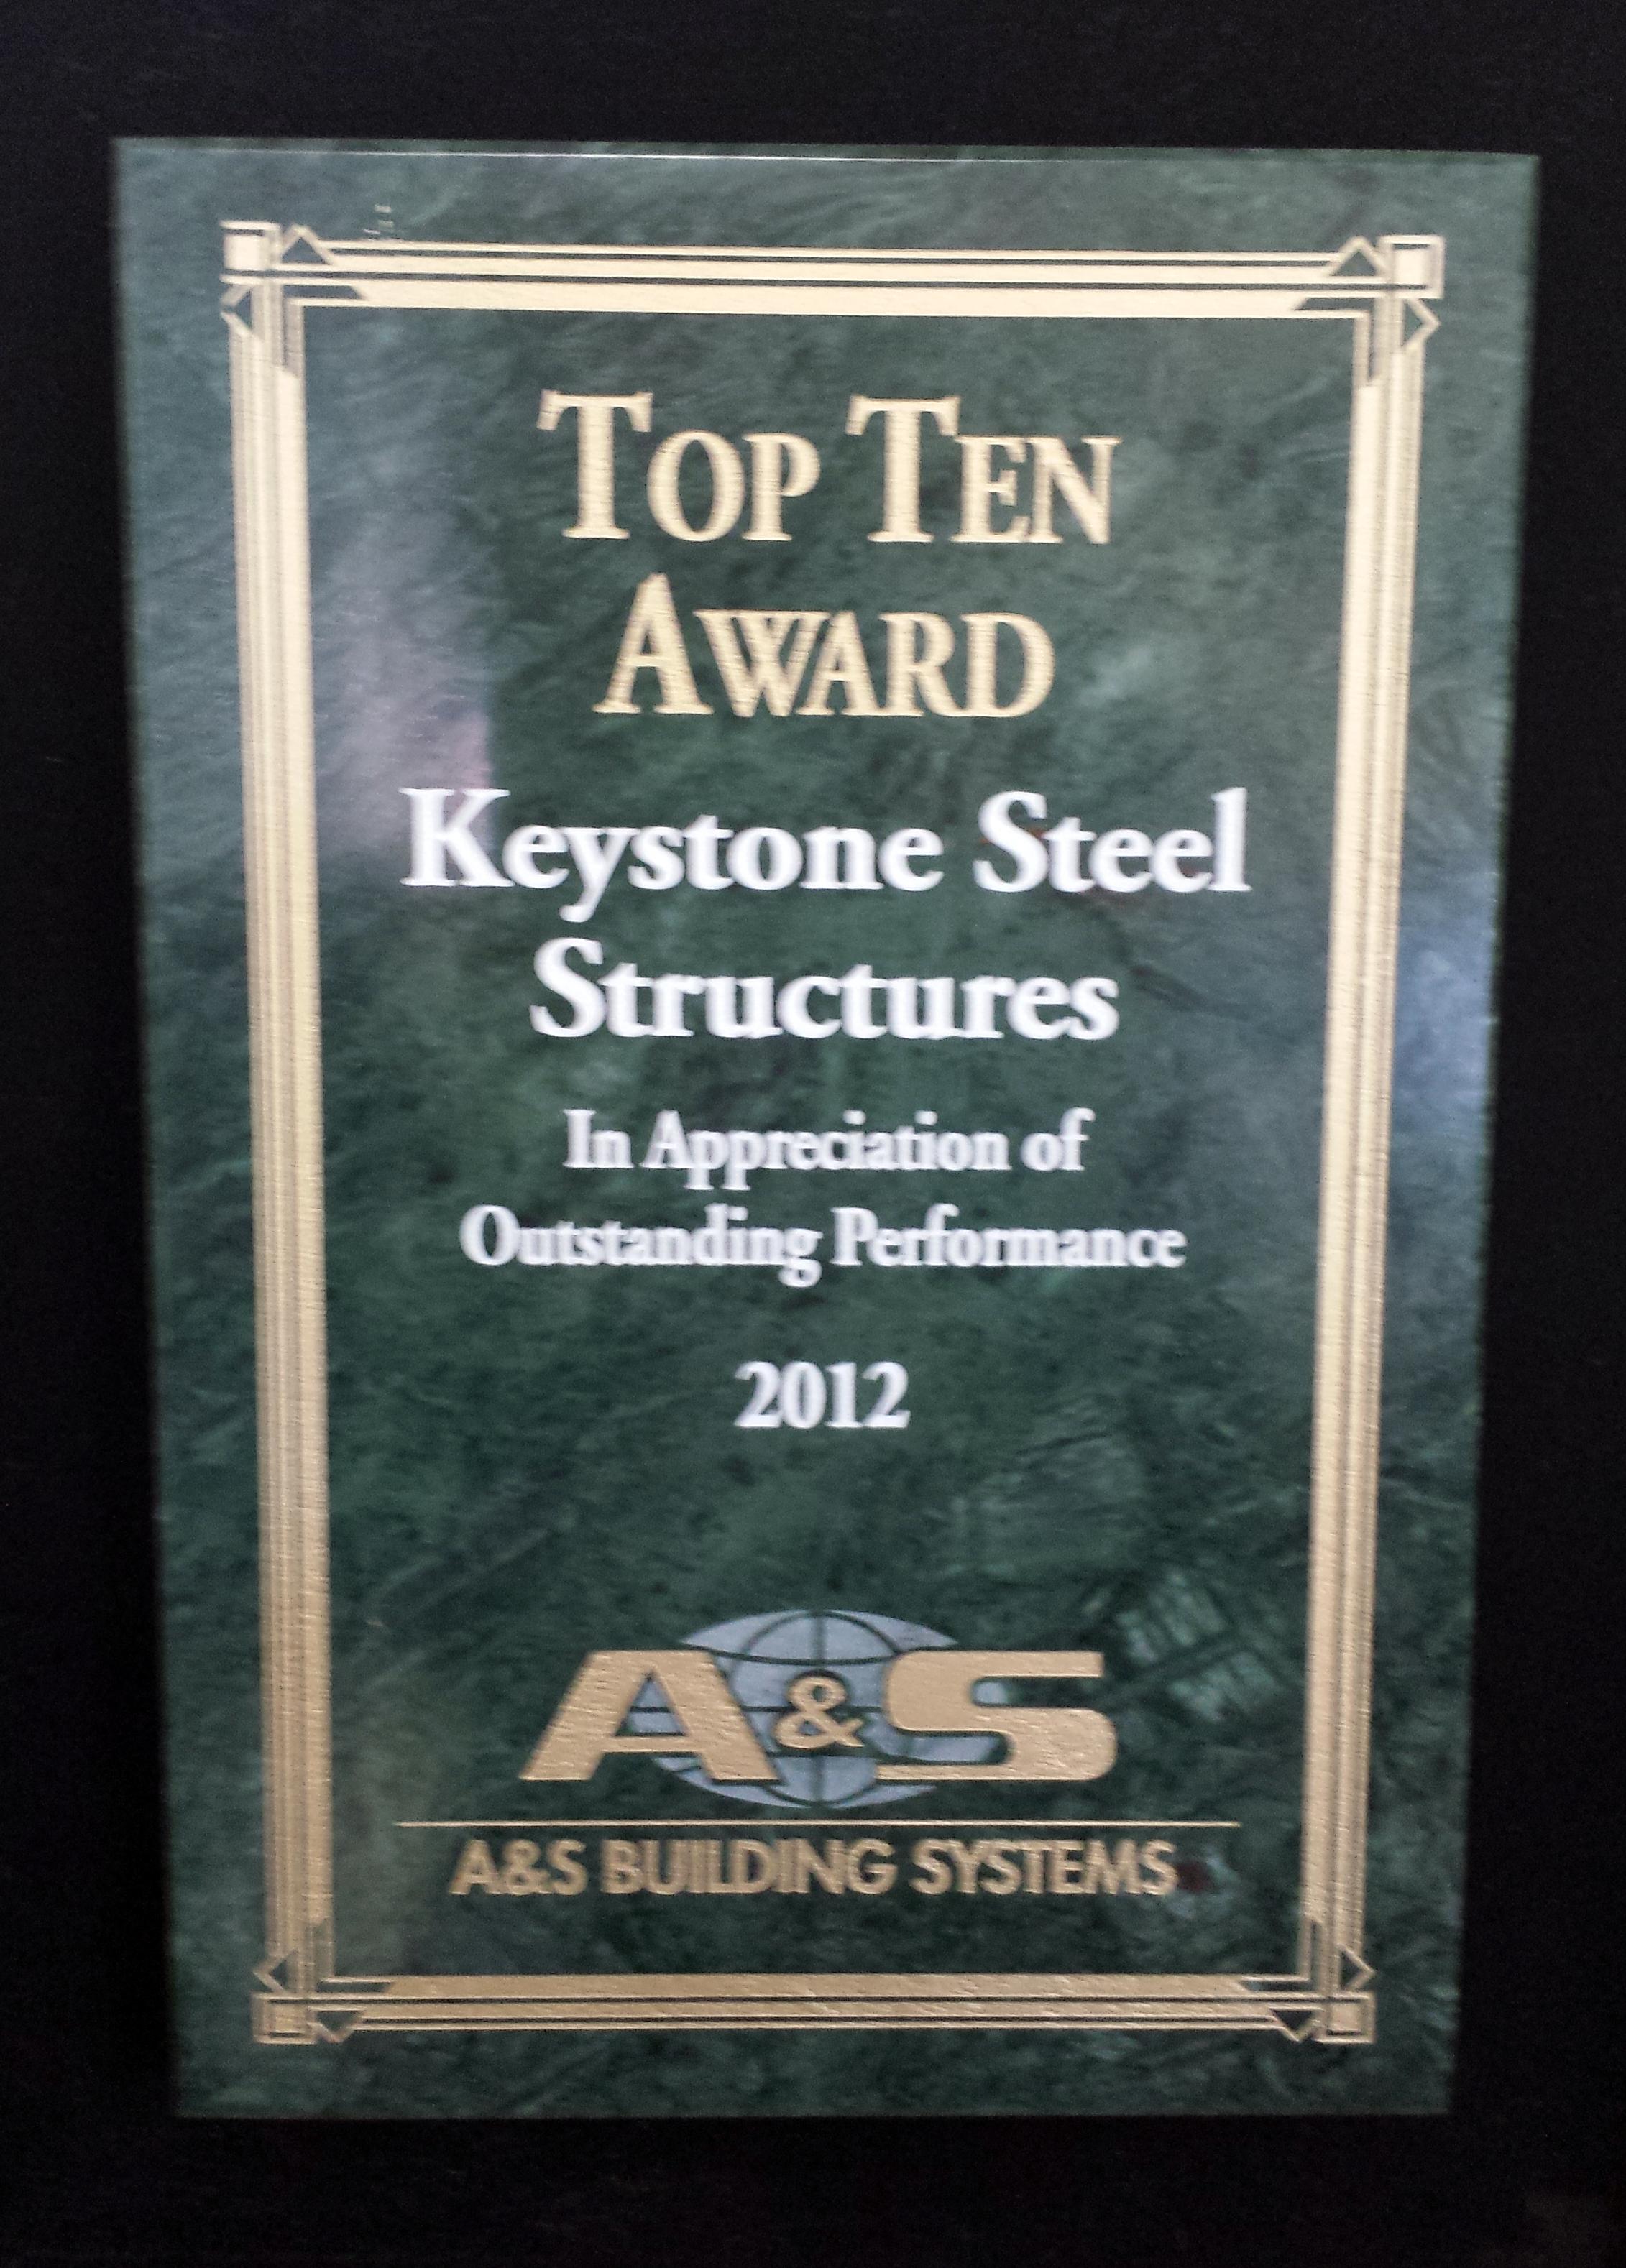 2012 Top Ten Award